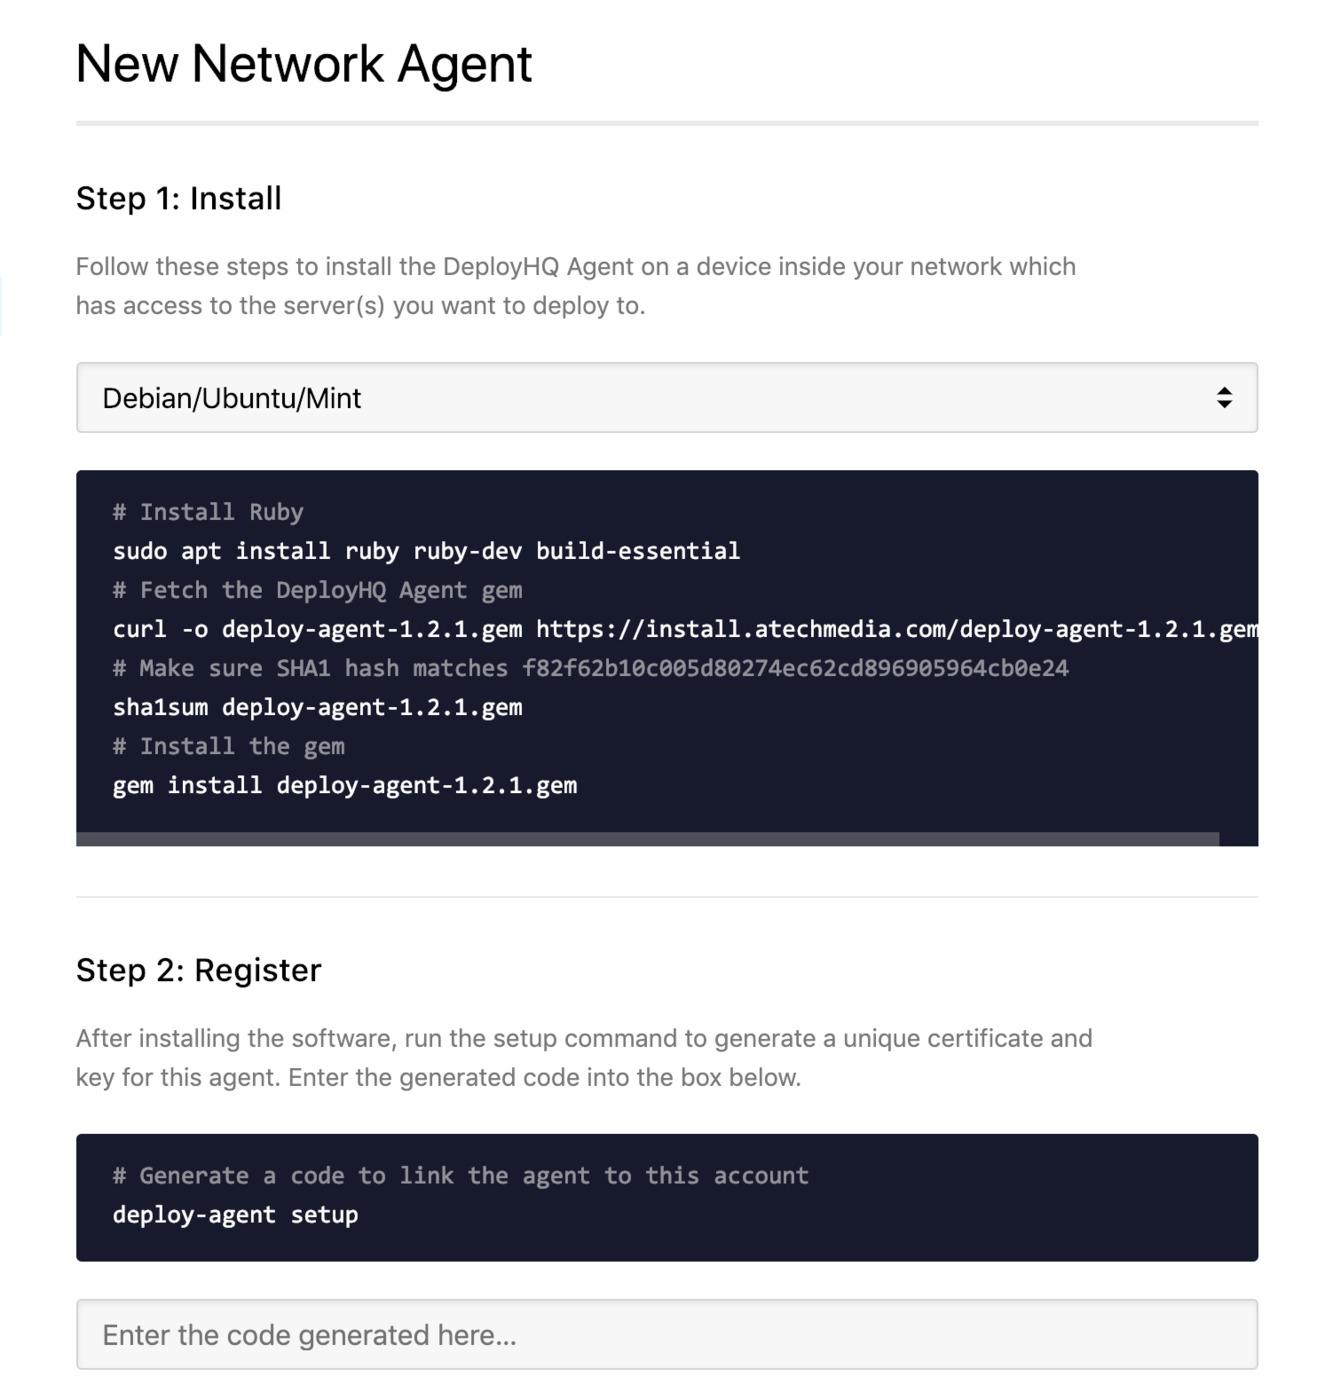 Start agent setup